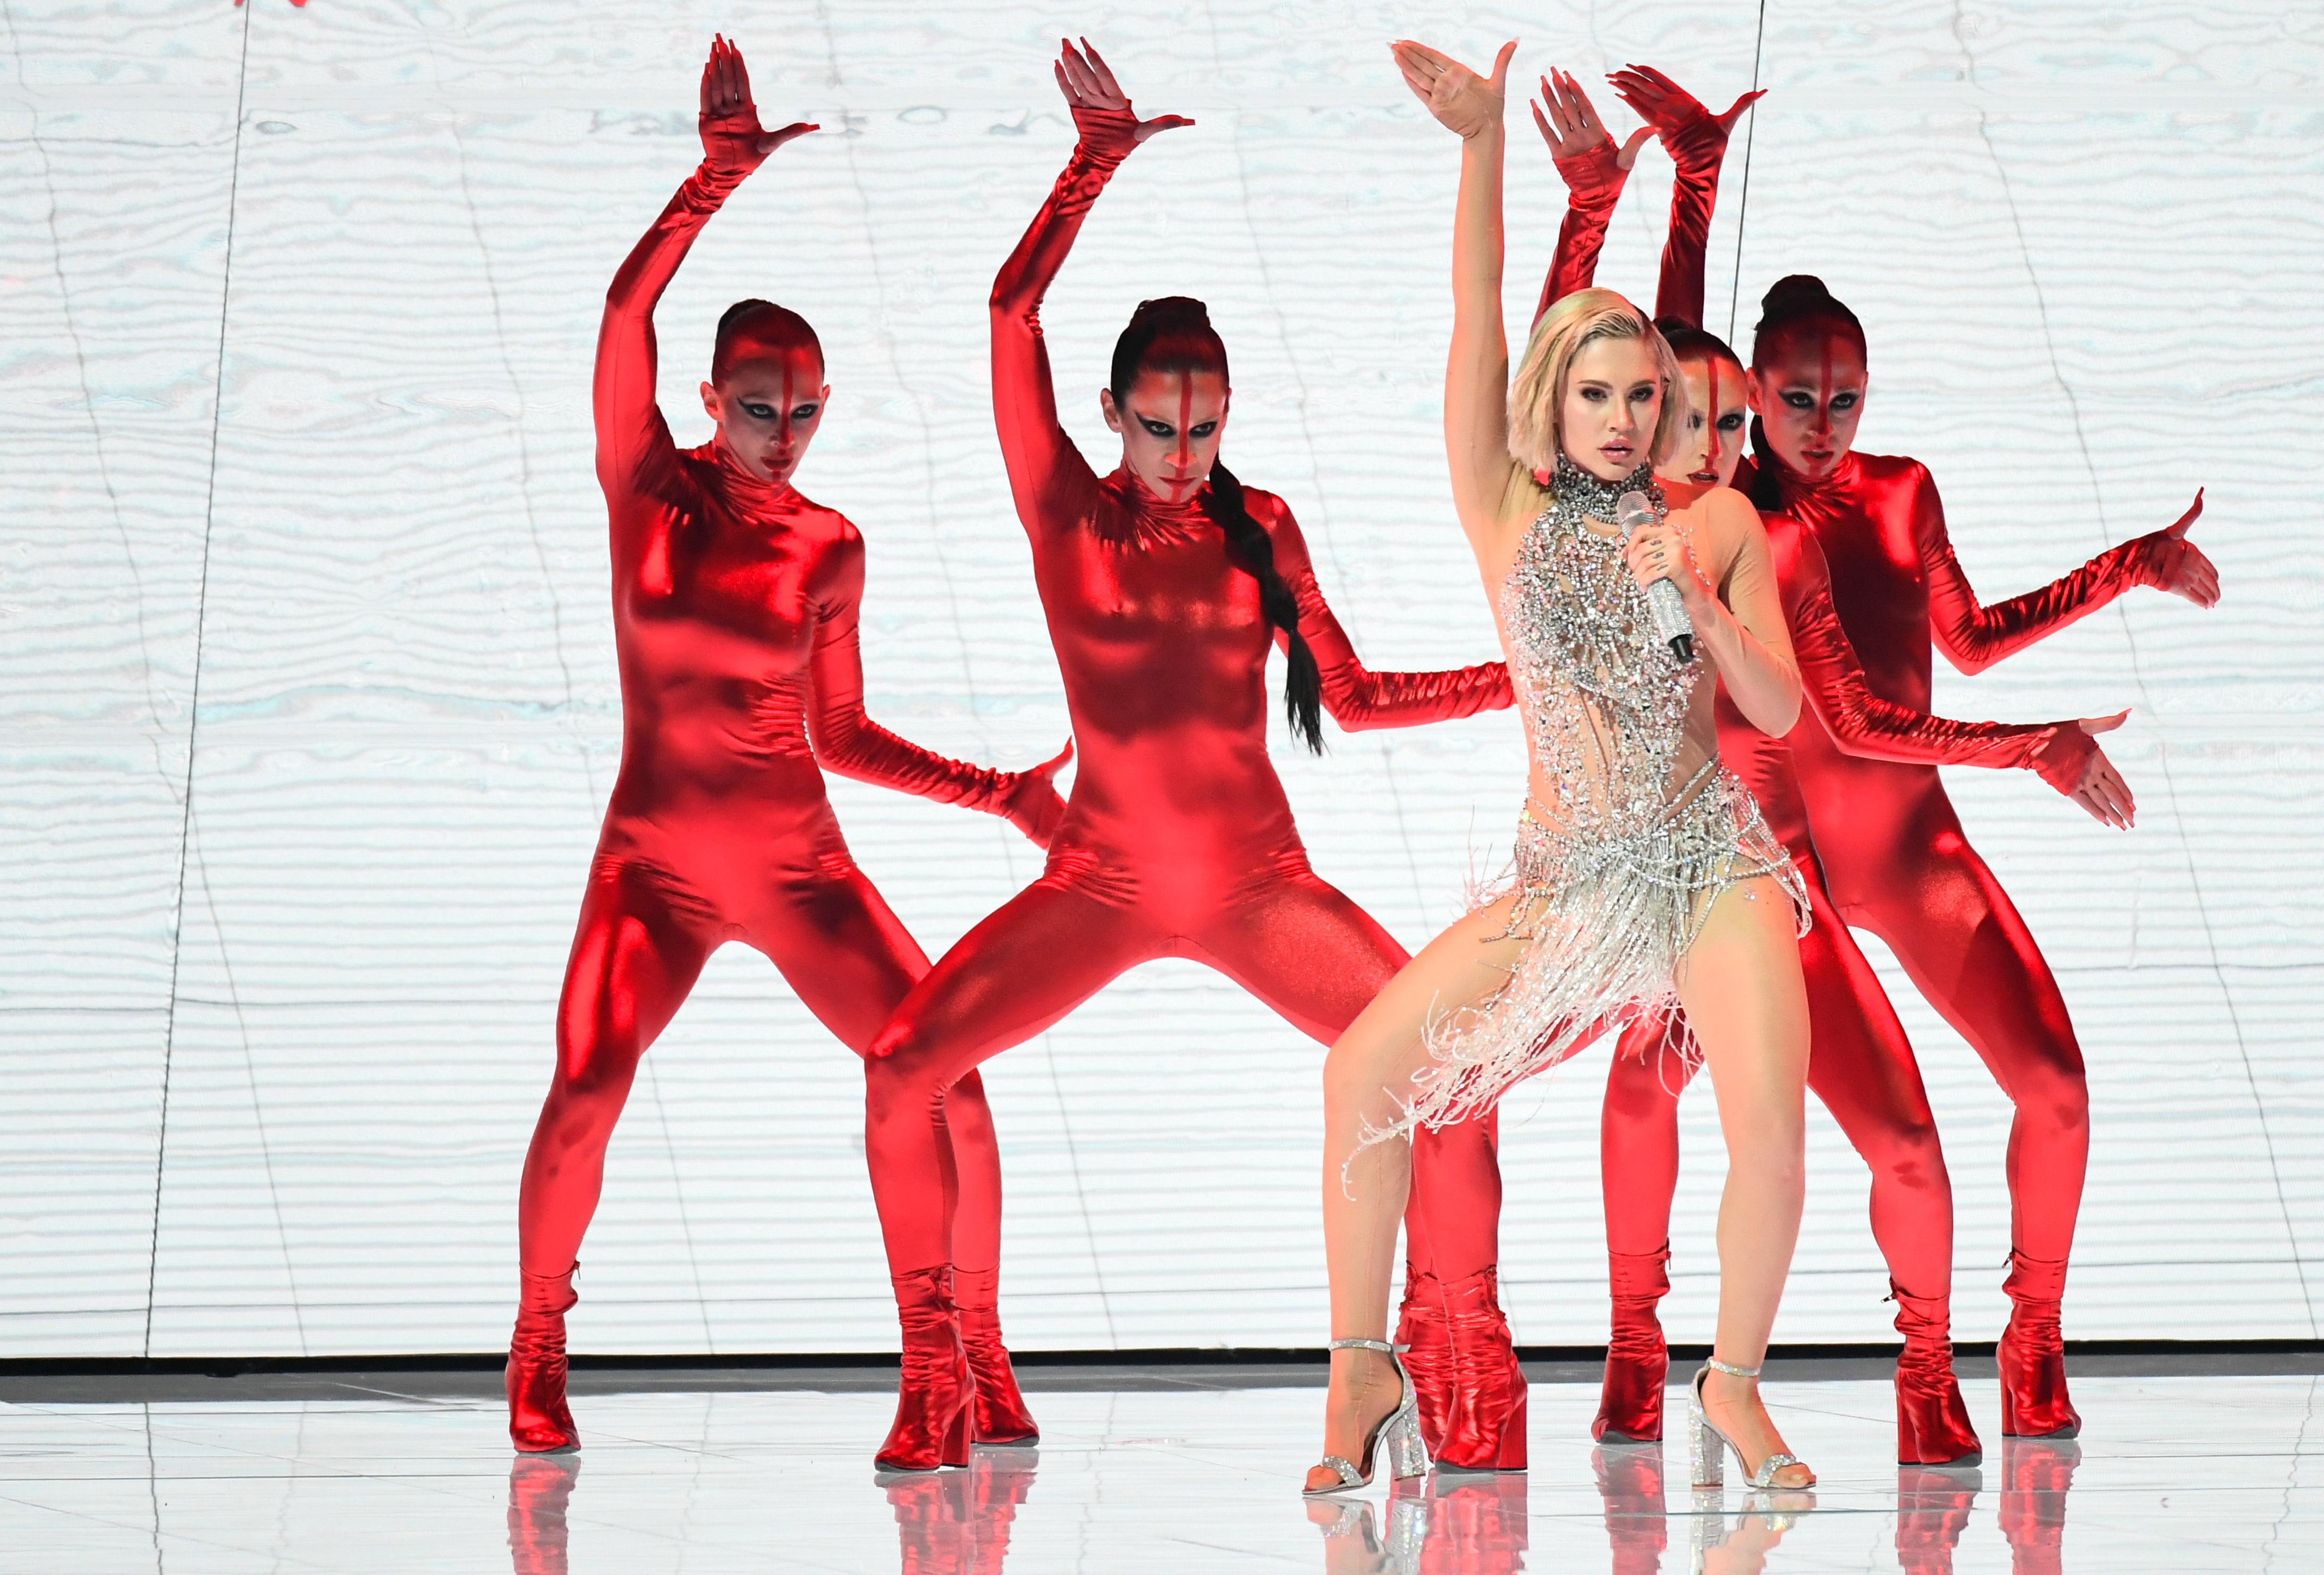 'El Diablo!' Cyprus Eurovision entry makes some see red